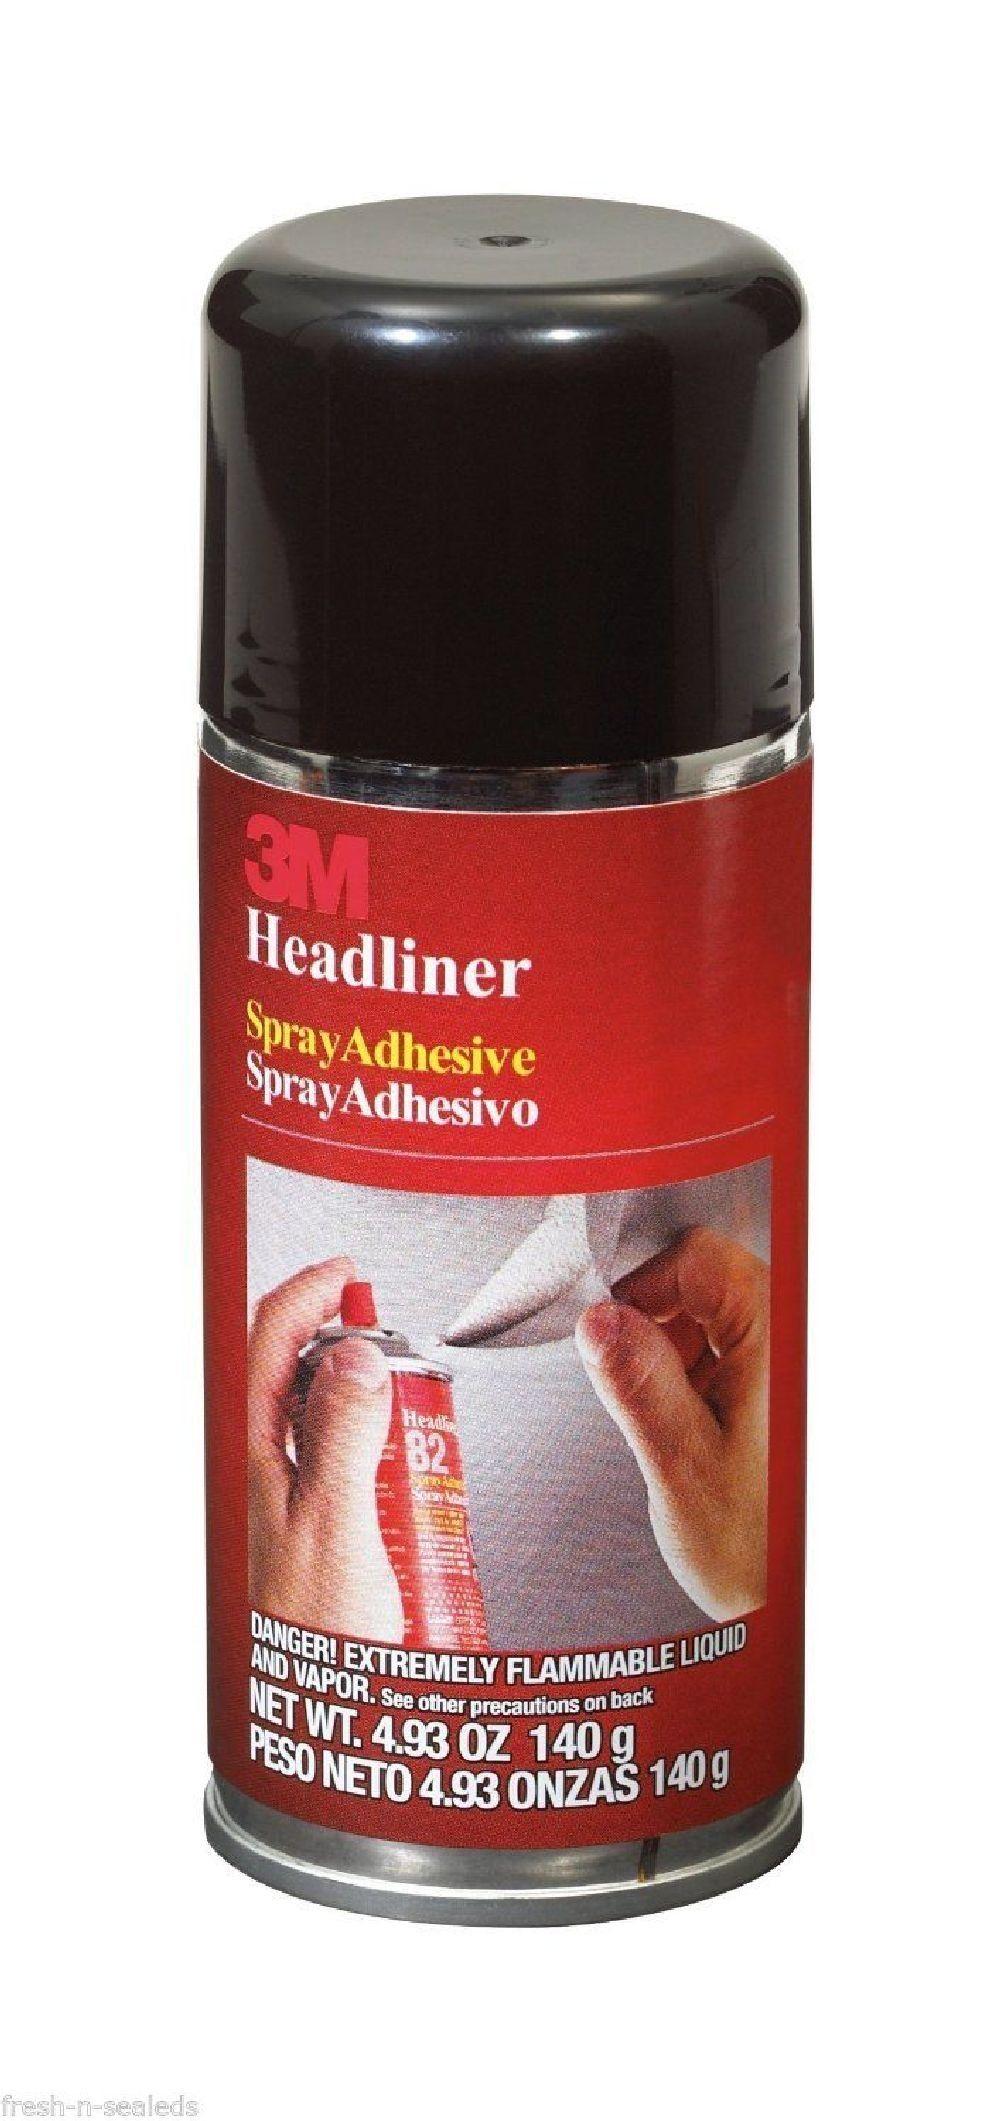 3M Headliner Spray Adhesive 4.93 oz Glue Repair Vehicle